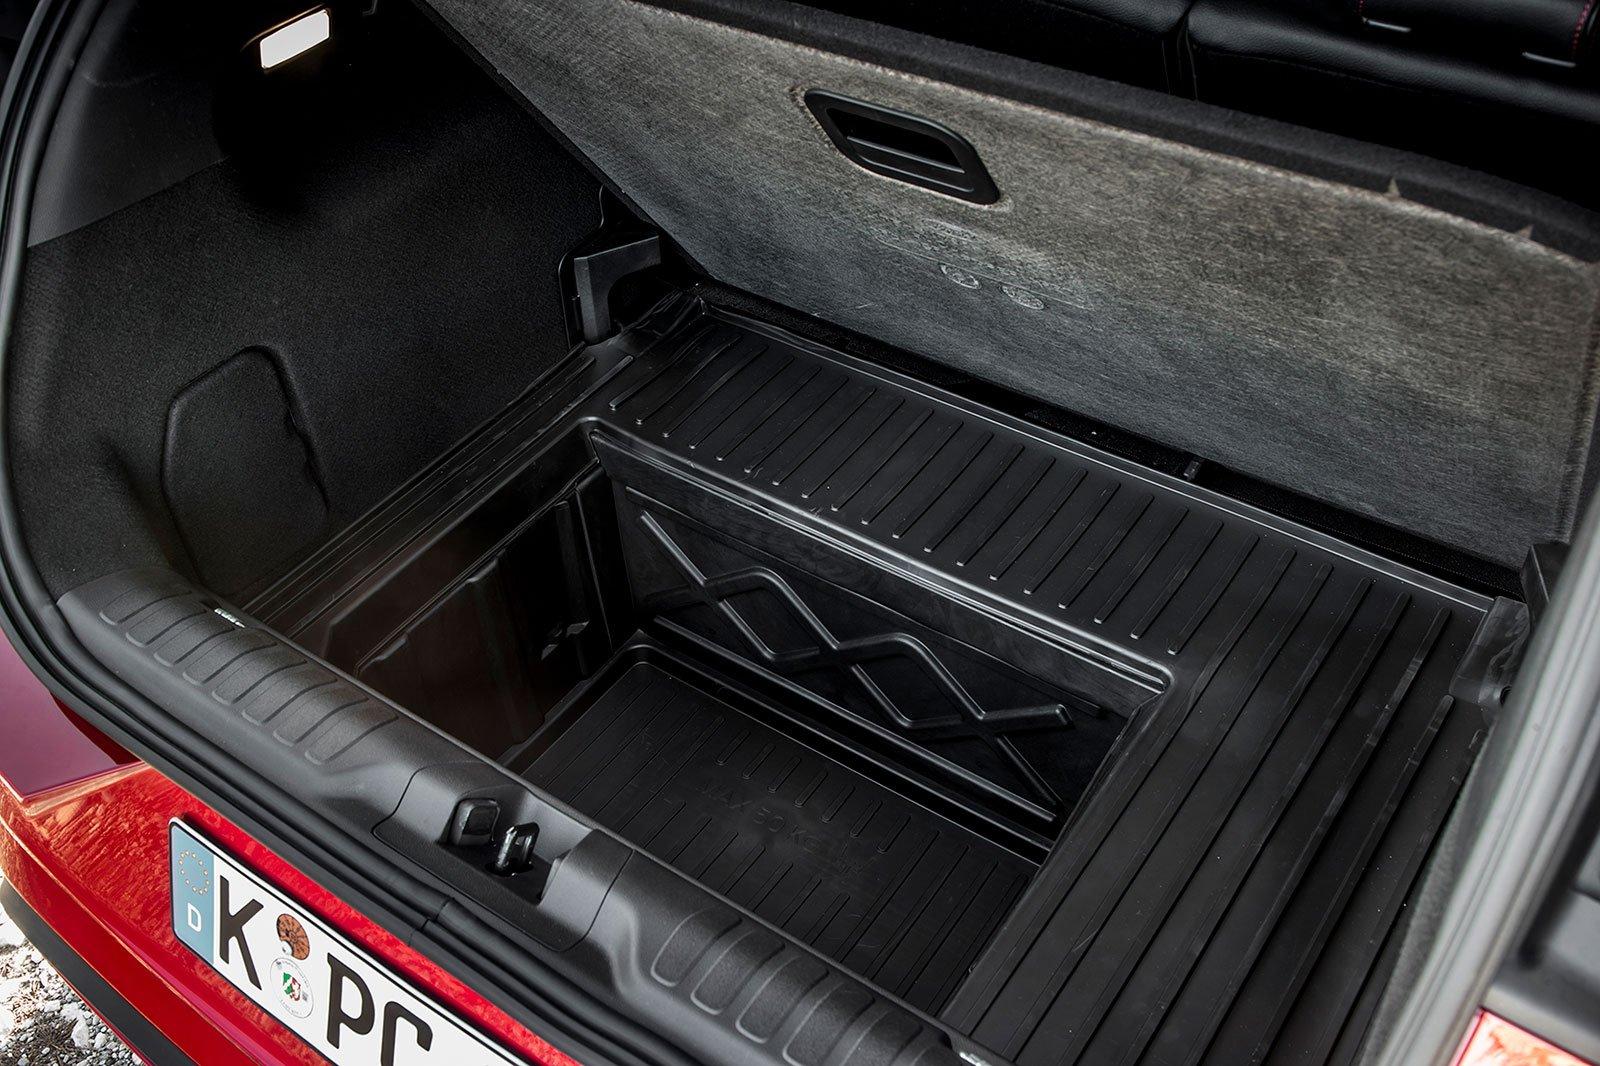 2020 Ford Puma 125 EcoBoost Hybrid Titanium megabox boot